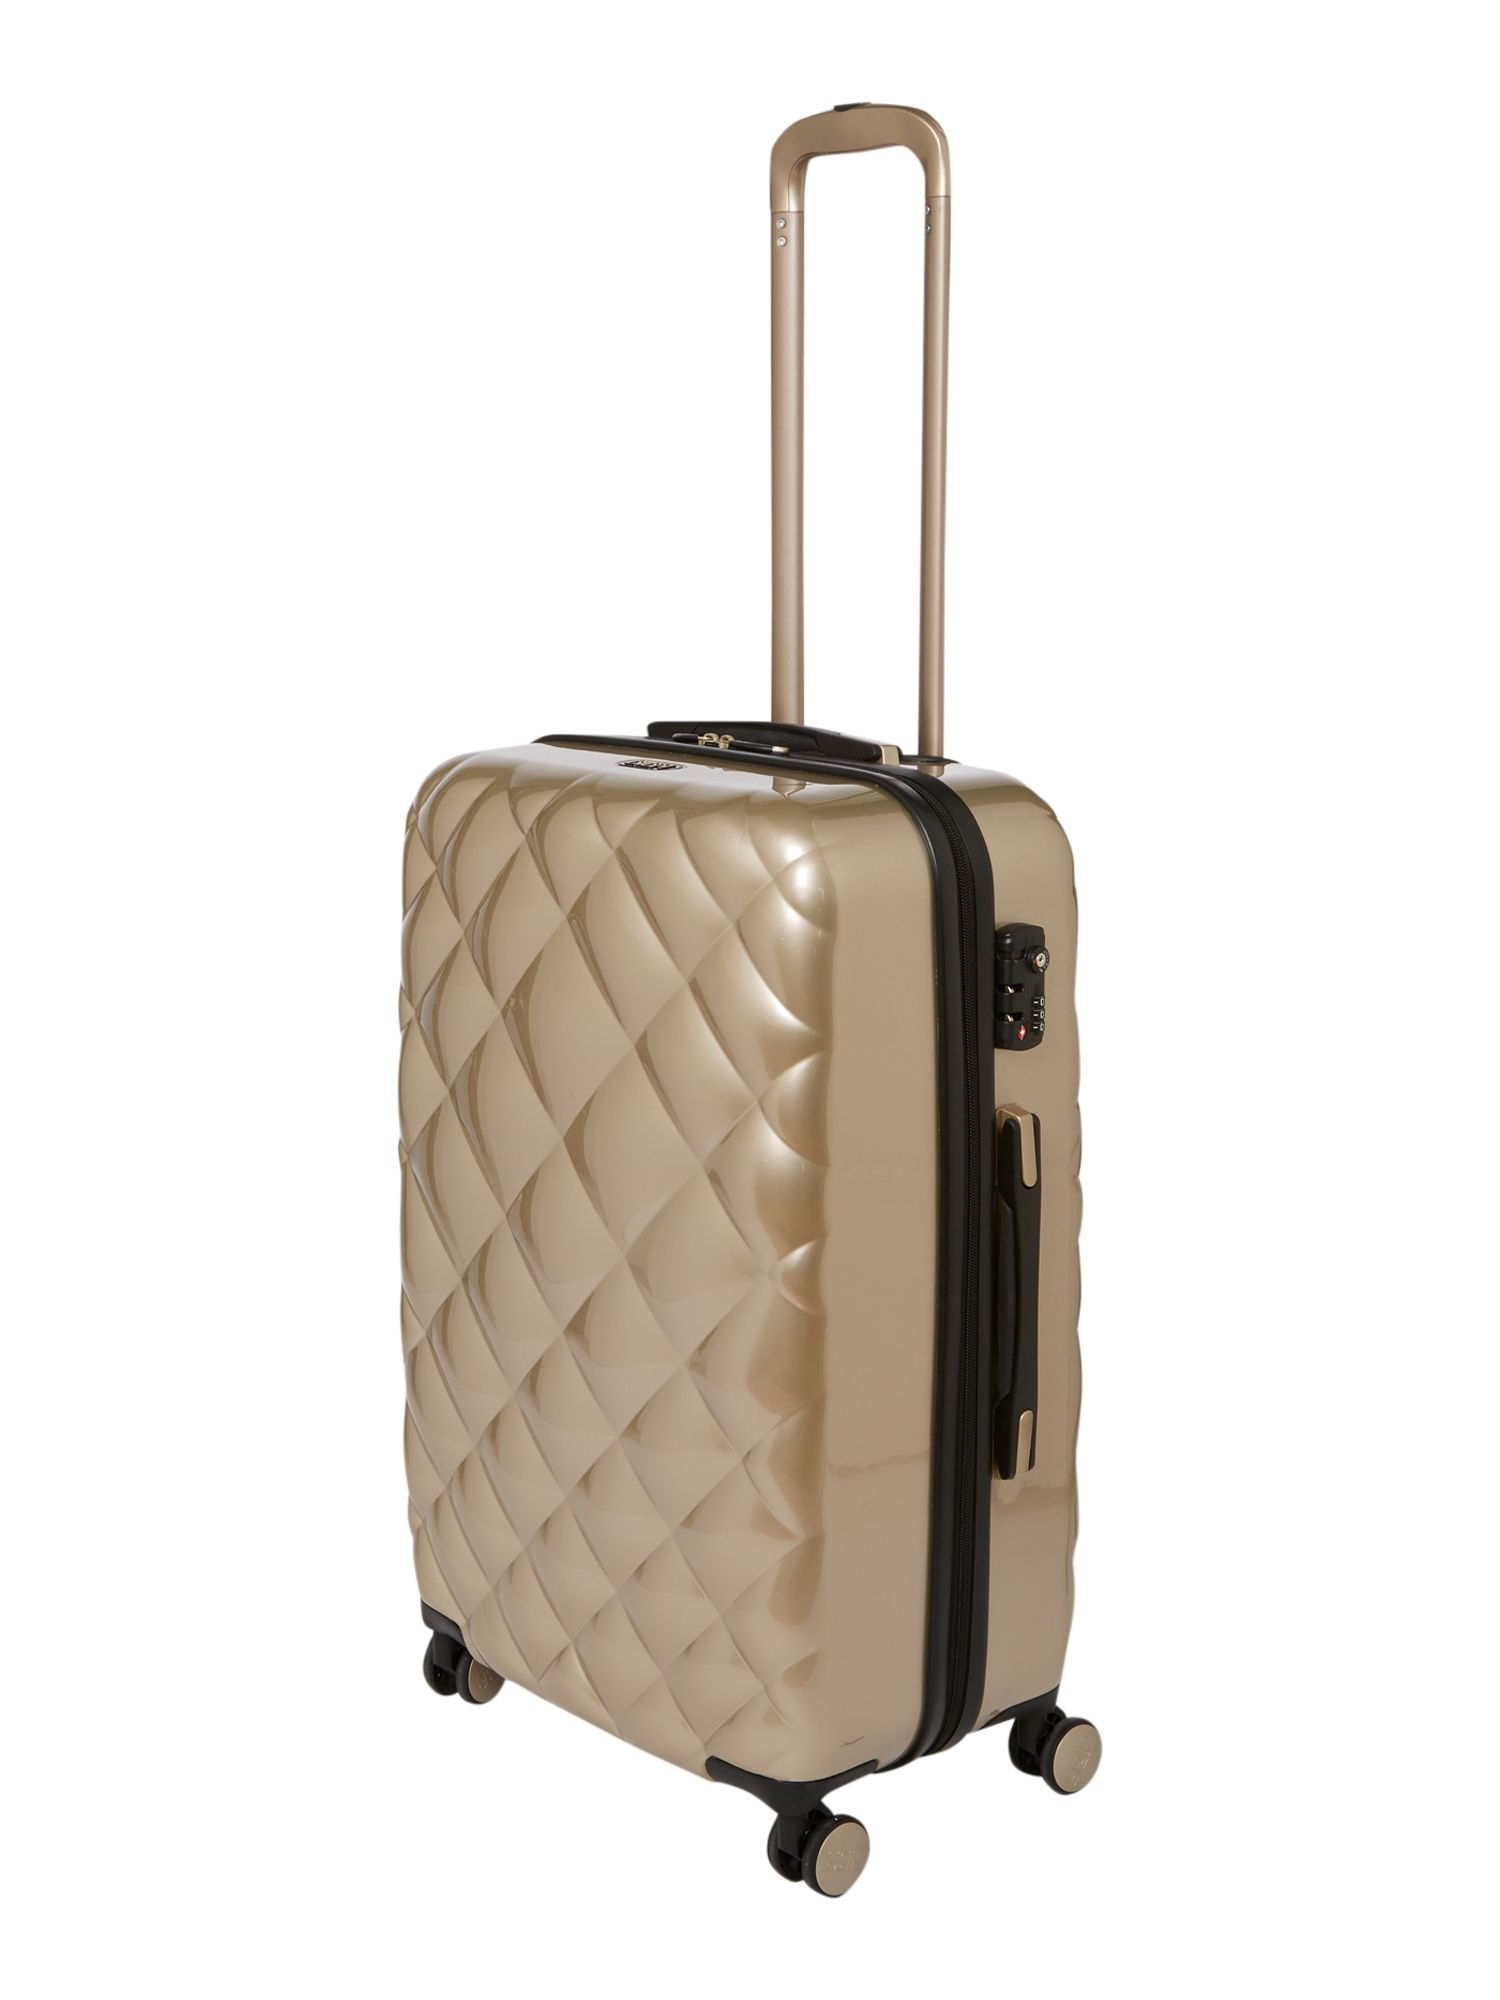 Medium Hard Suitcase | Luggage And Suitcases